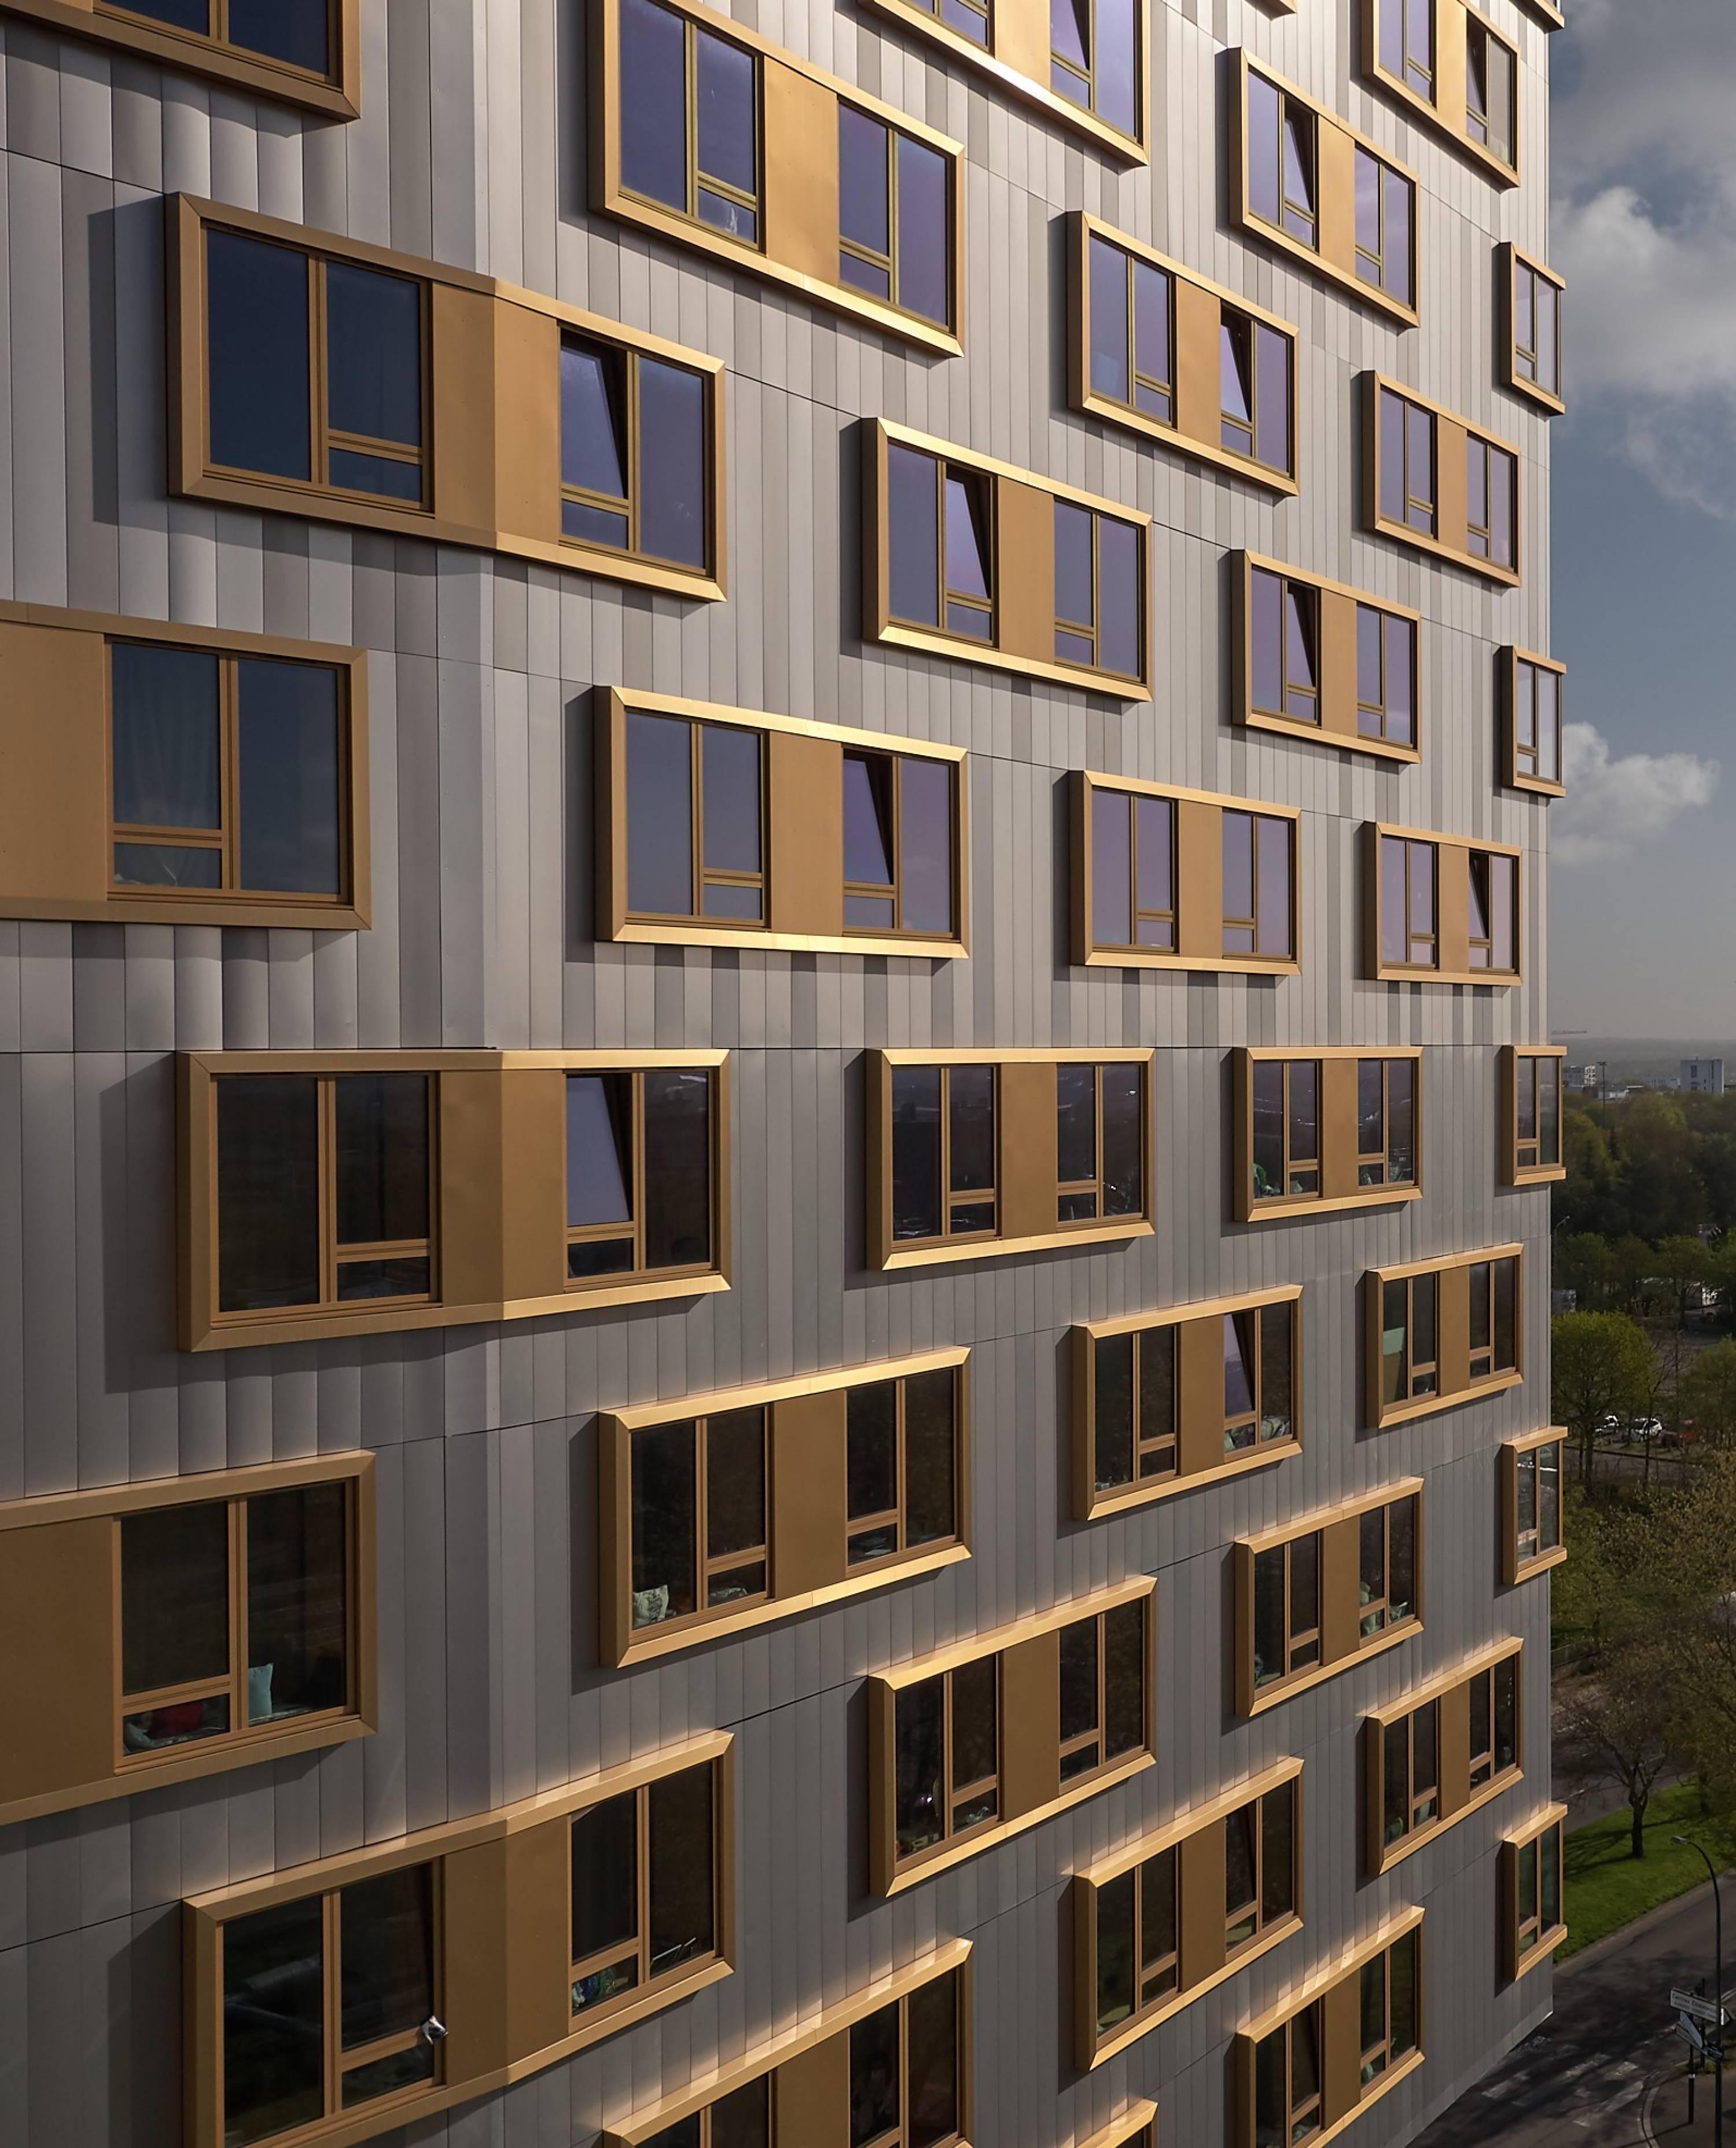 Students accommodation tower, Normandie Saumurois district, Rennes, 2017 ©S.Chalmeau